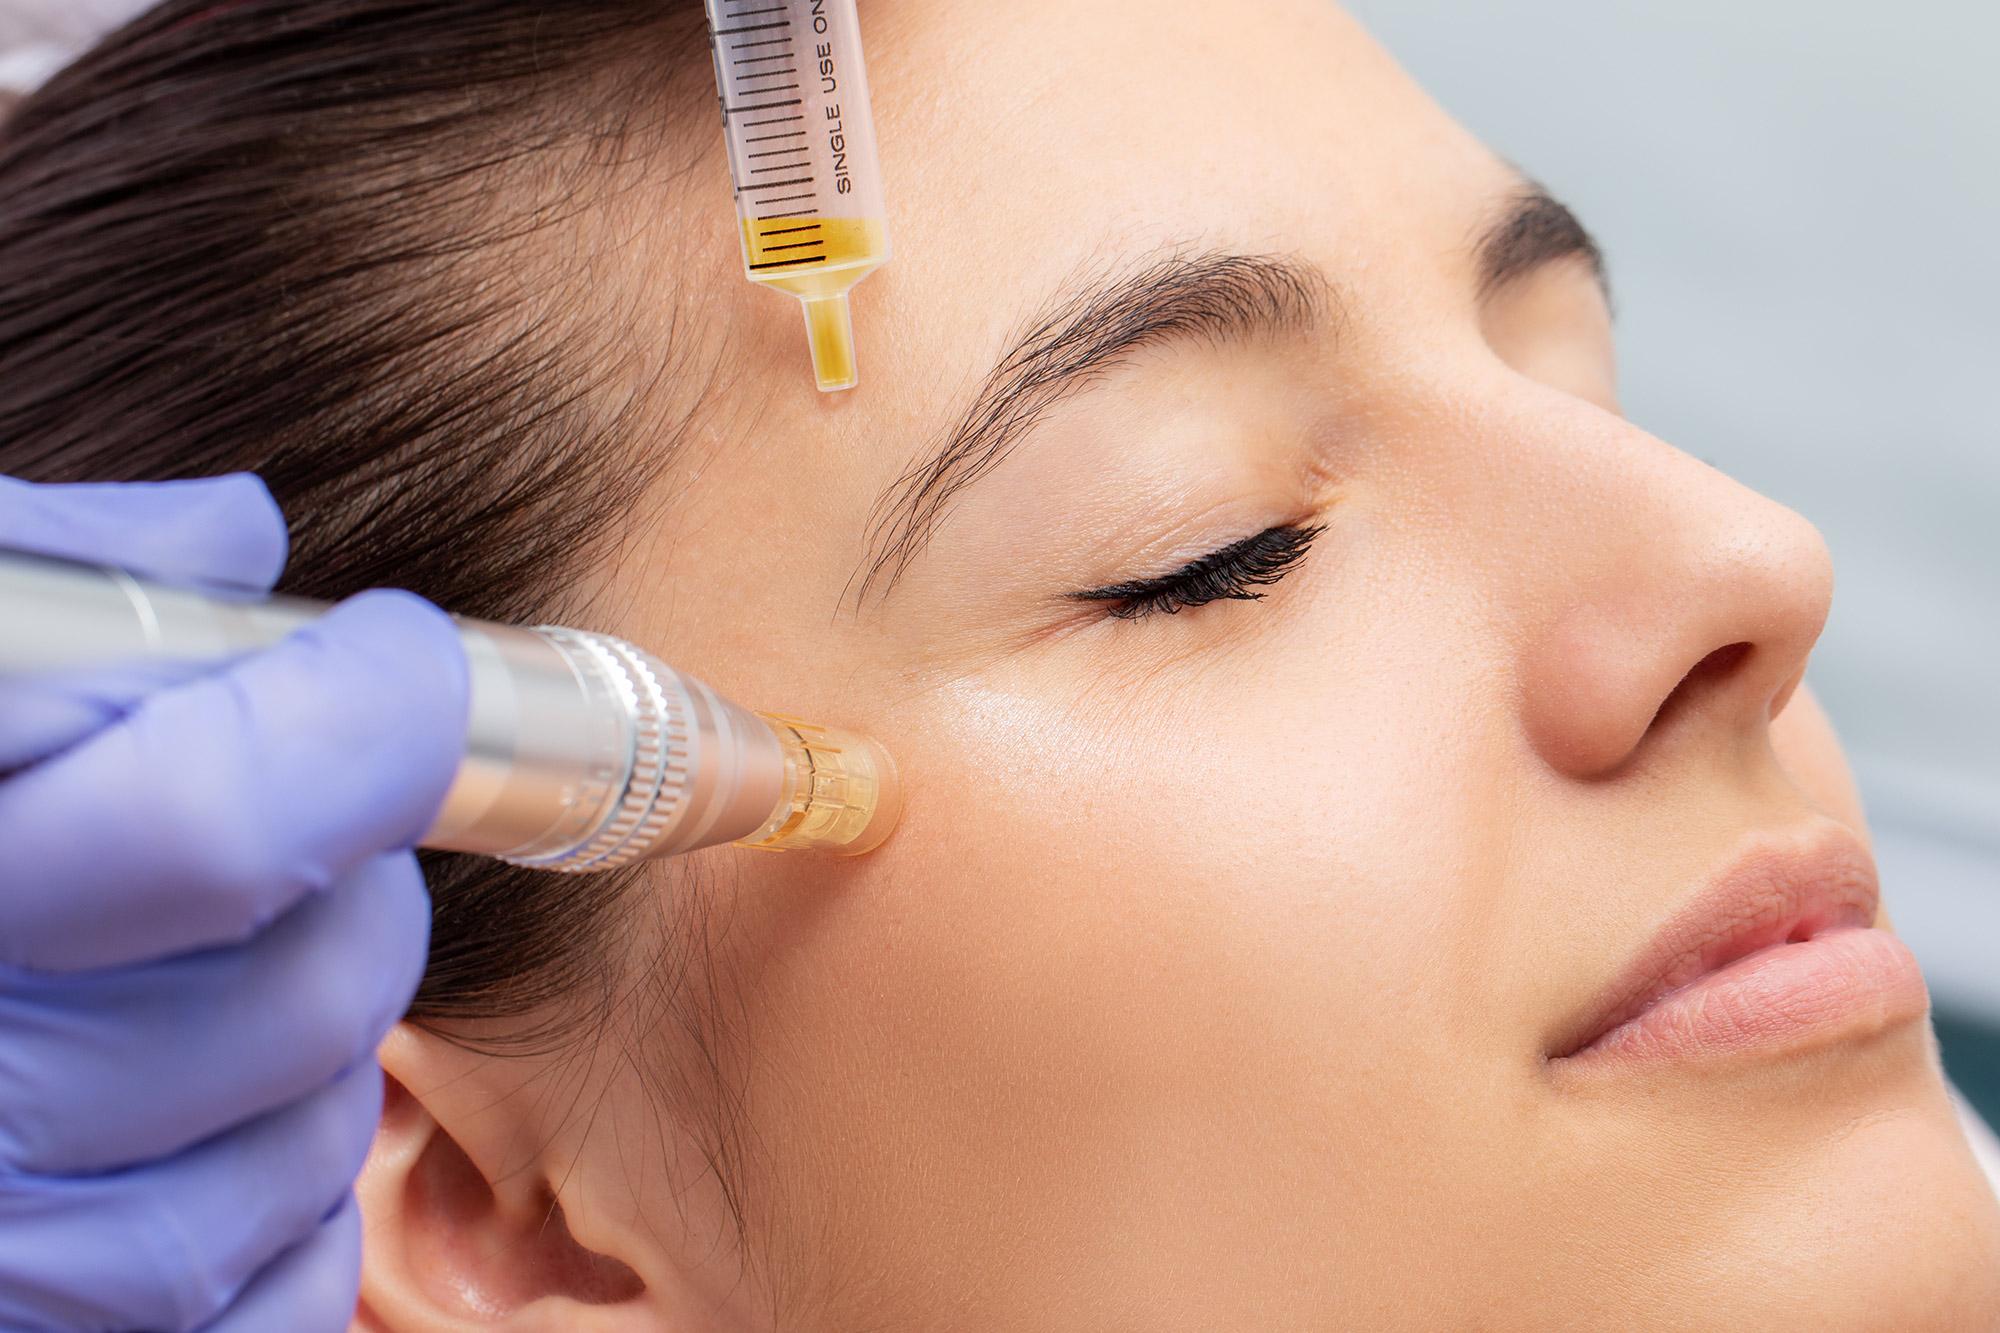 Using Botox to Treat Crow's Feet